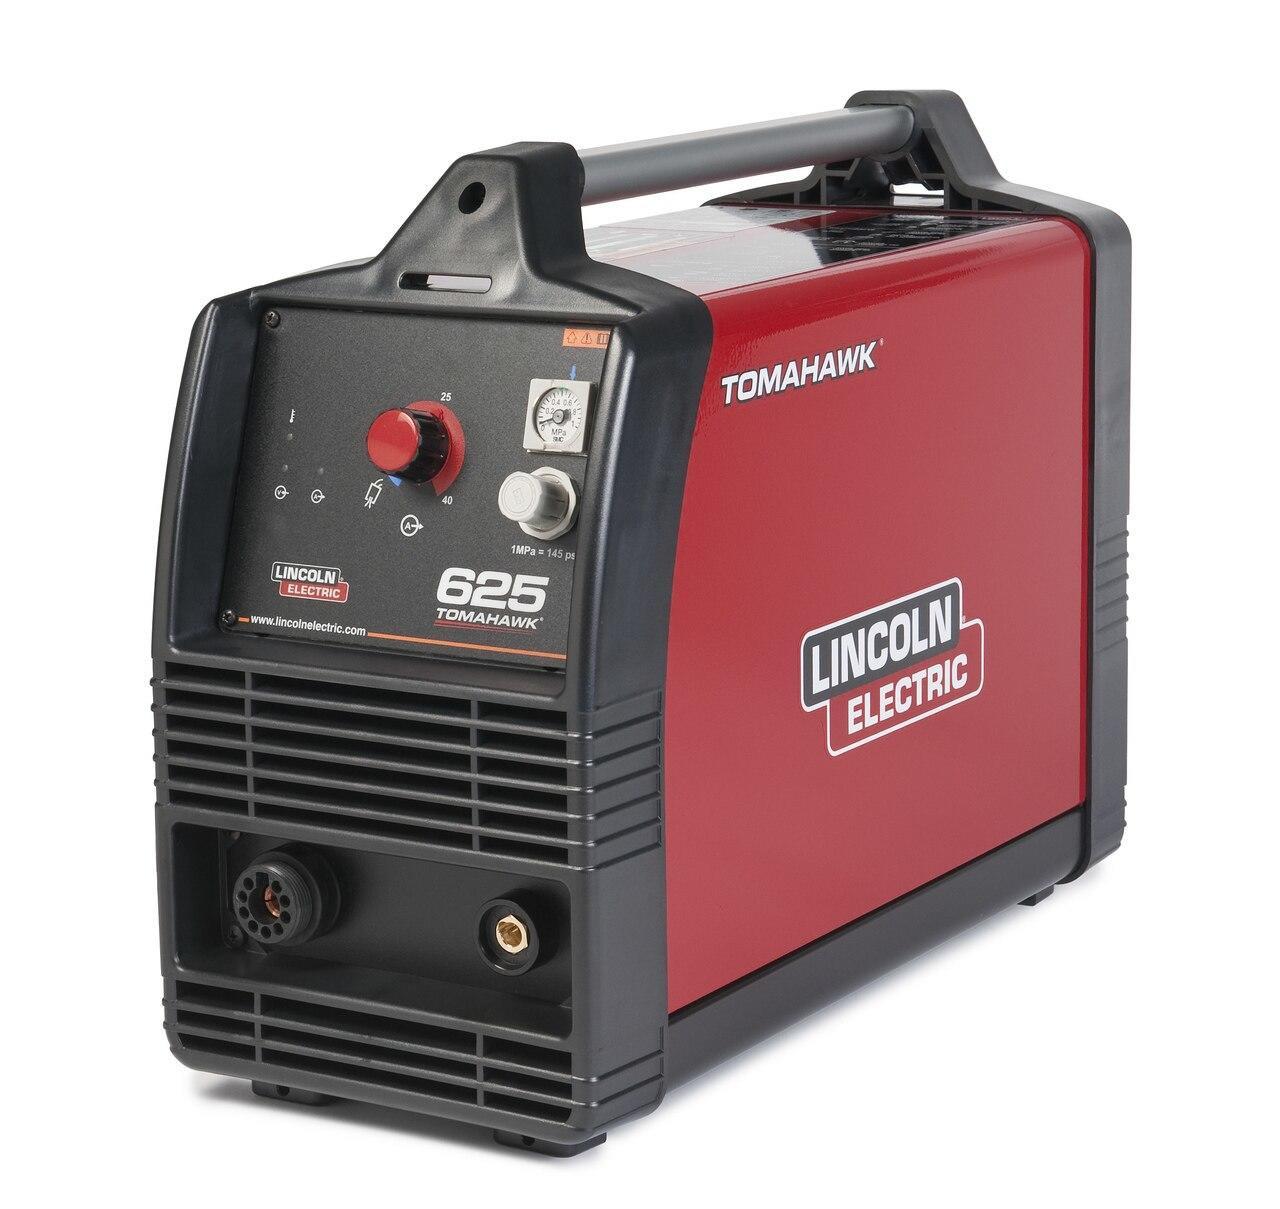 Lincoln Tomahawk 625 Handheld Plasma Cutter K2807-1